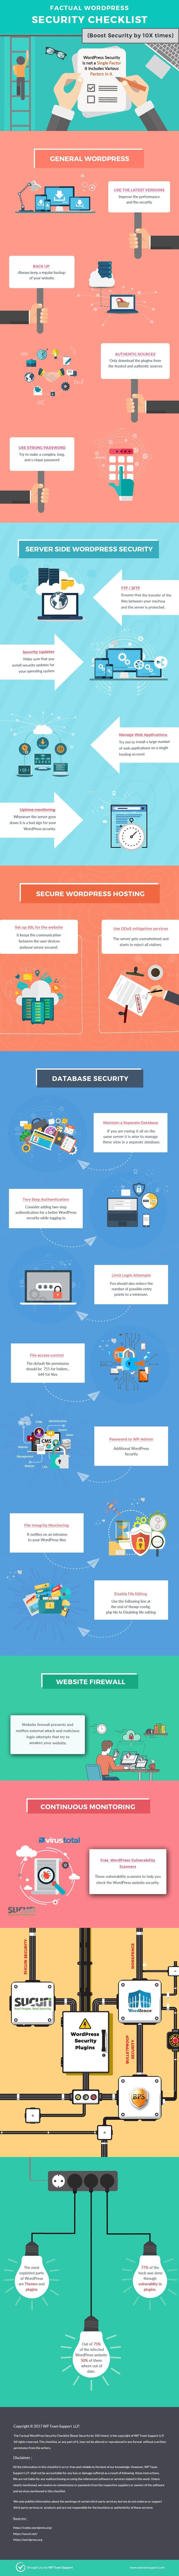 20 WordPress Security Tips [Infographic]